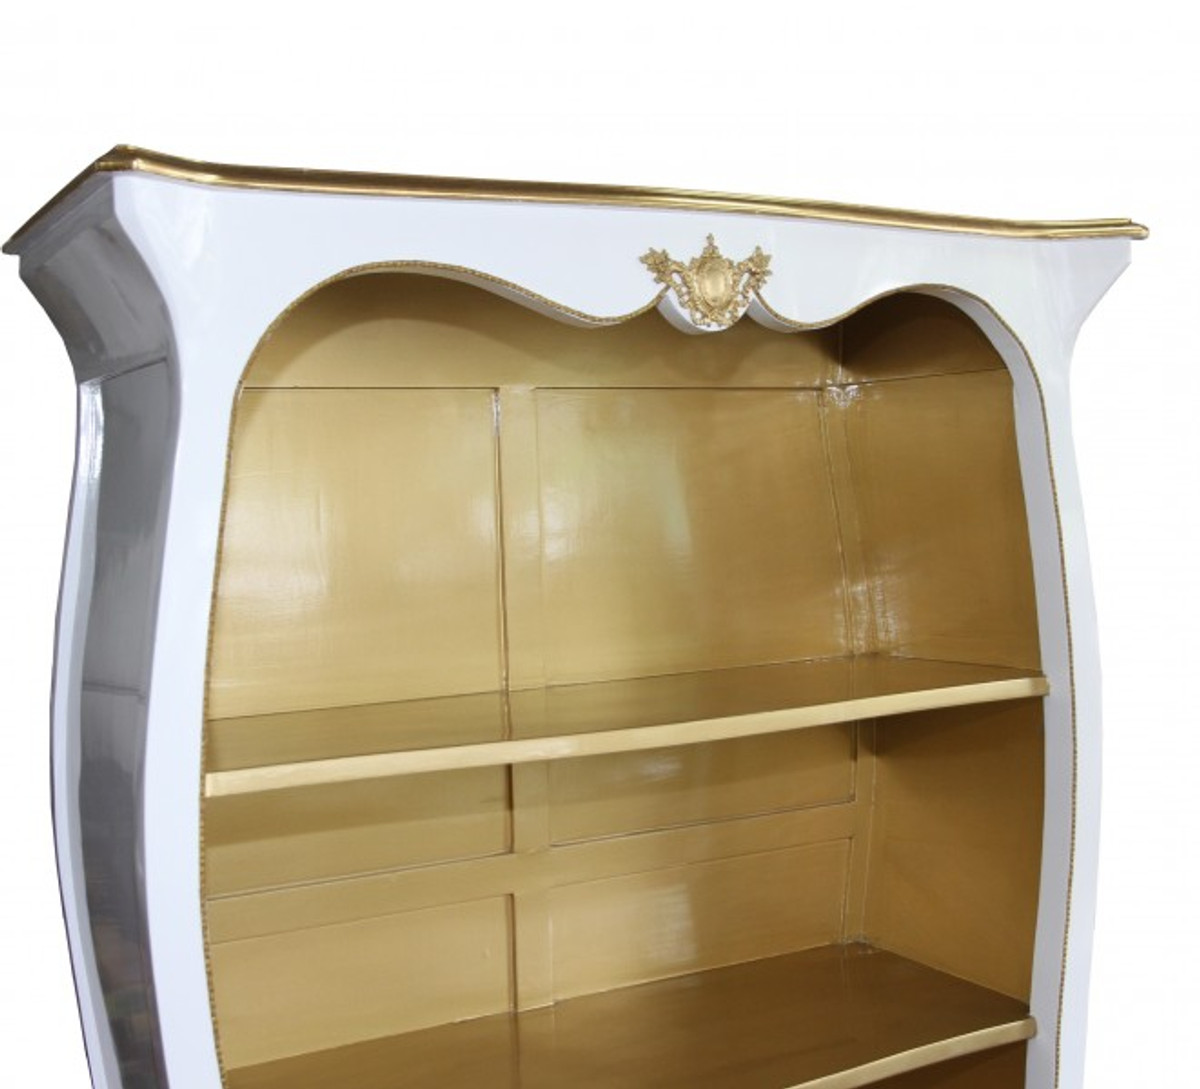 Casa Padrino Barock Bücherschrank Weiß Hochglanz / Gold B 110 x H 169 cm Bücherregal Regal Schrank - Limited Edition 5